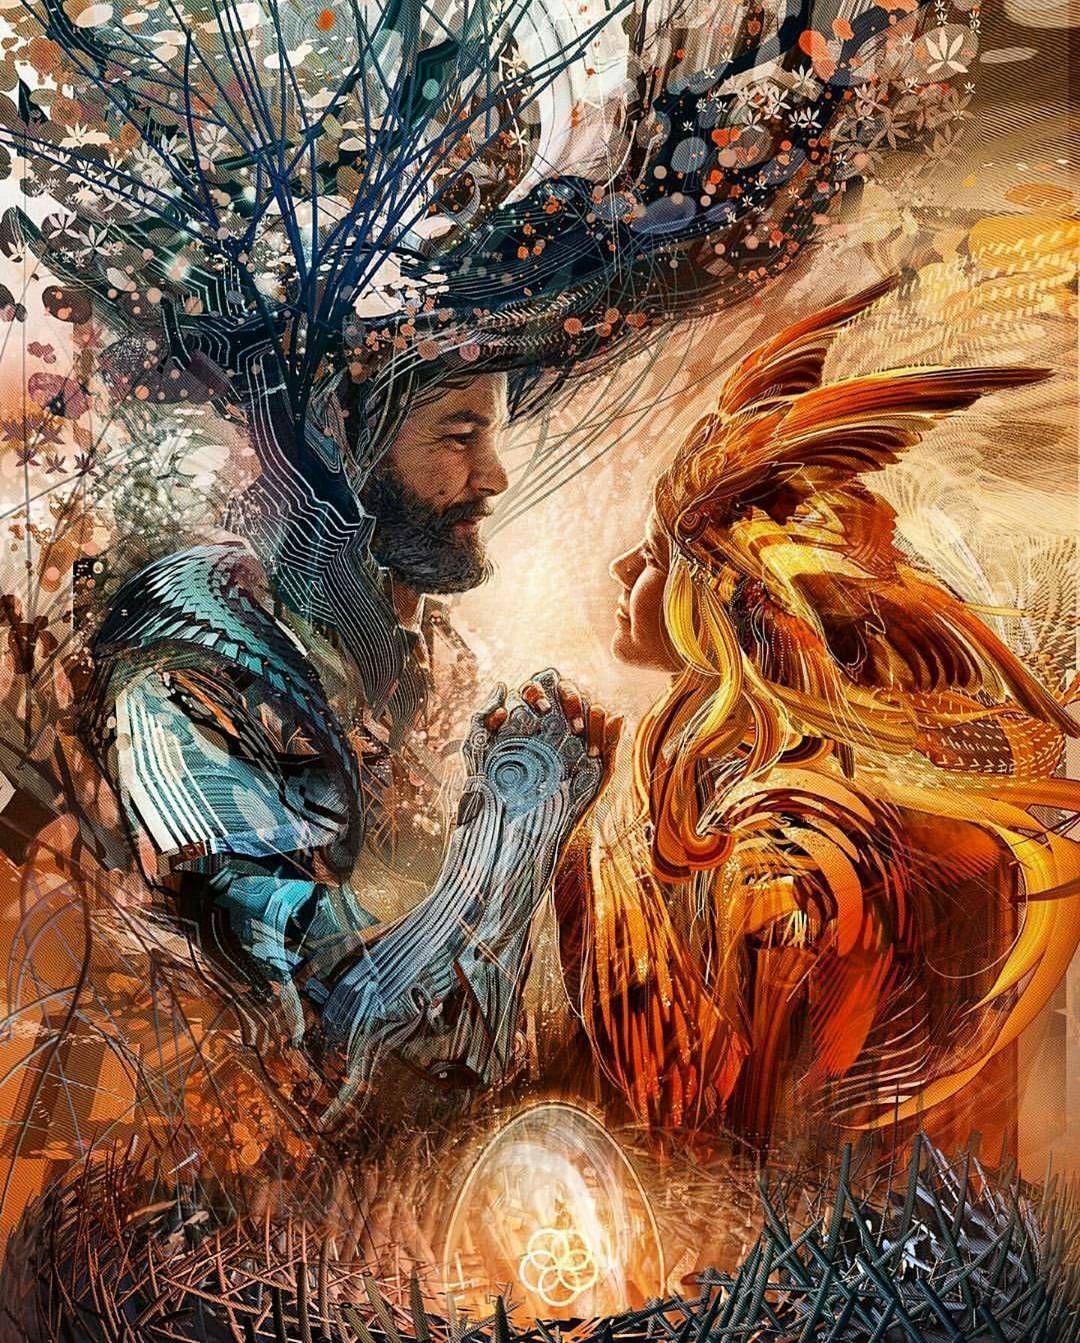 Piece by @android_jones ____ #illustration #drawing #draw #character #characterdesign #fantasy #fantasyart #instaart #instadaily #conceptart #cgart #digitalart #digitalpainting #helloeclosion #inspiration #inspiring #paint #painting #artsy #picoftheday #artoftheday #bestartfeatures #epic #epicfantasy #magic by devilzsmile.com #devilzsmile